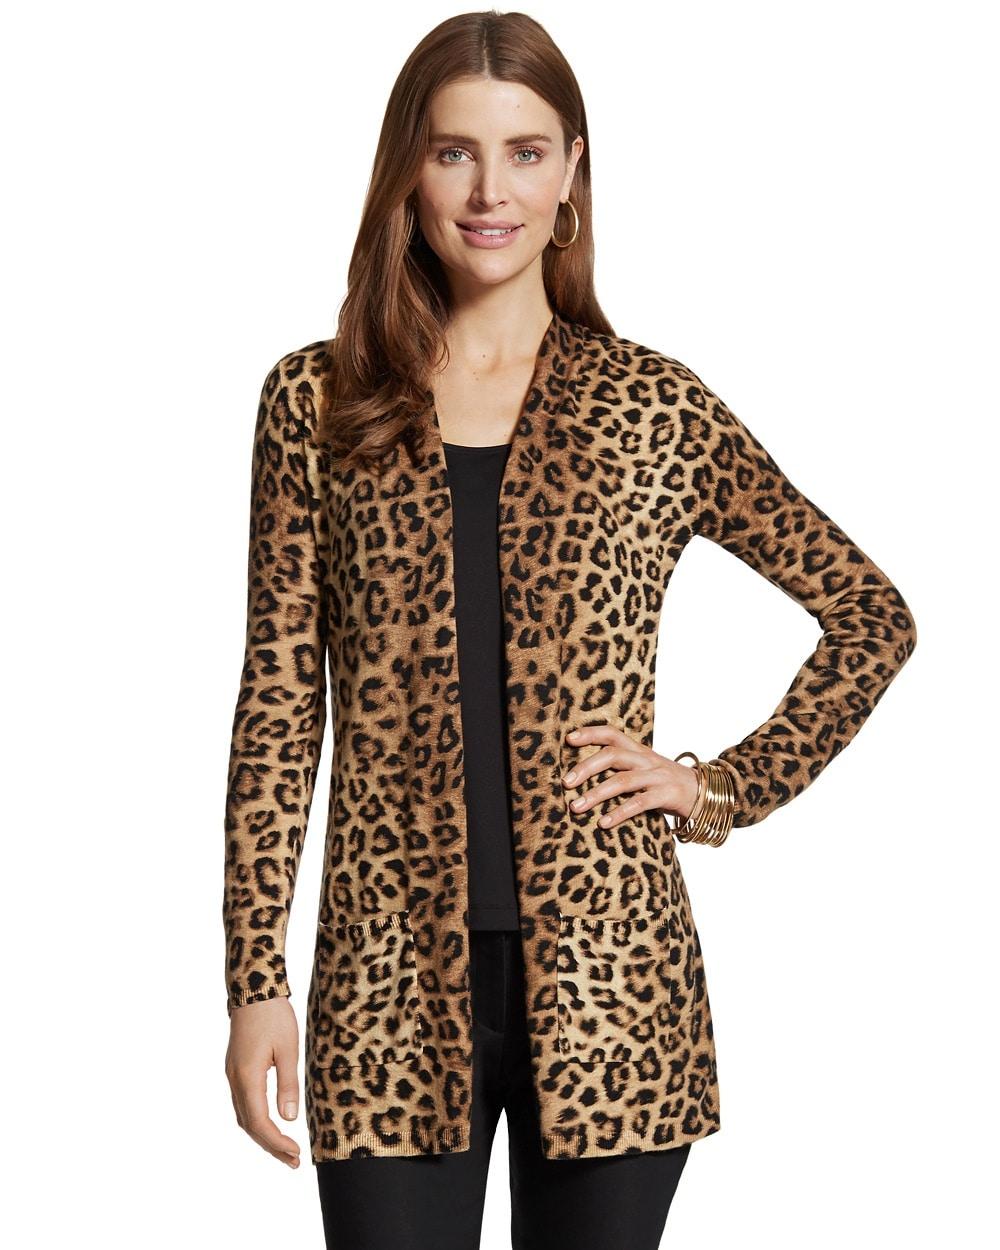 Danielle Leopard Print Cardigan - Chicos